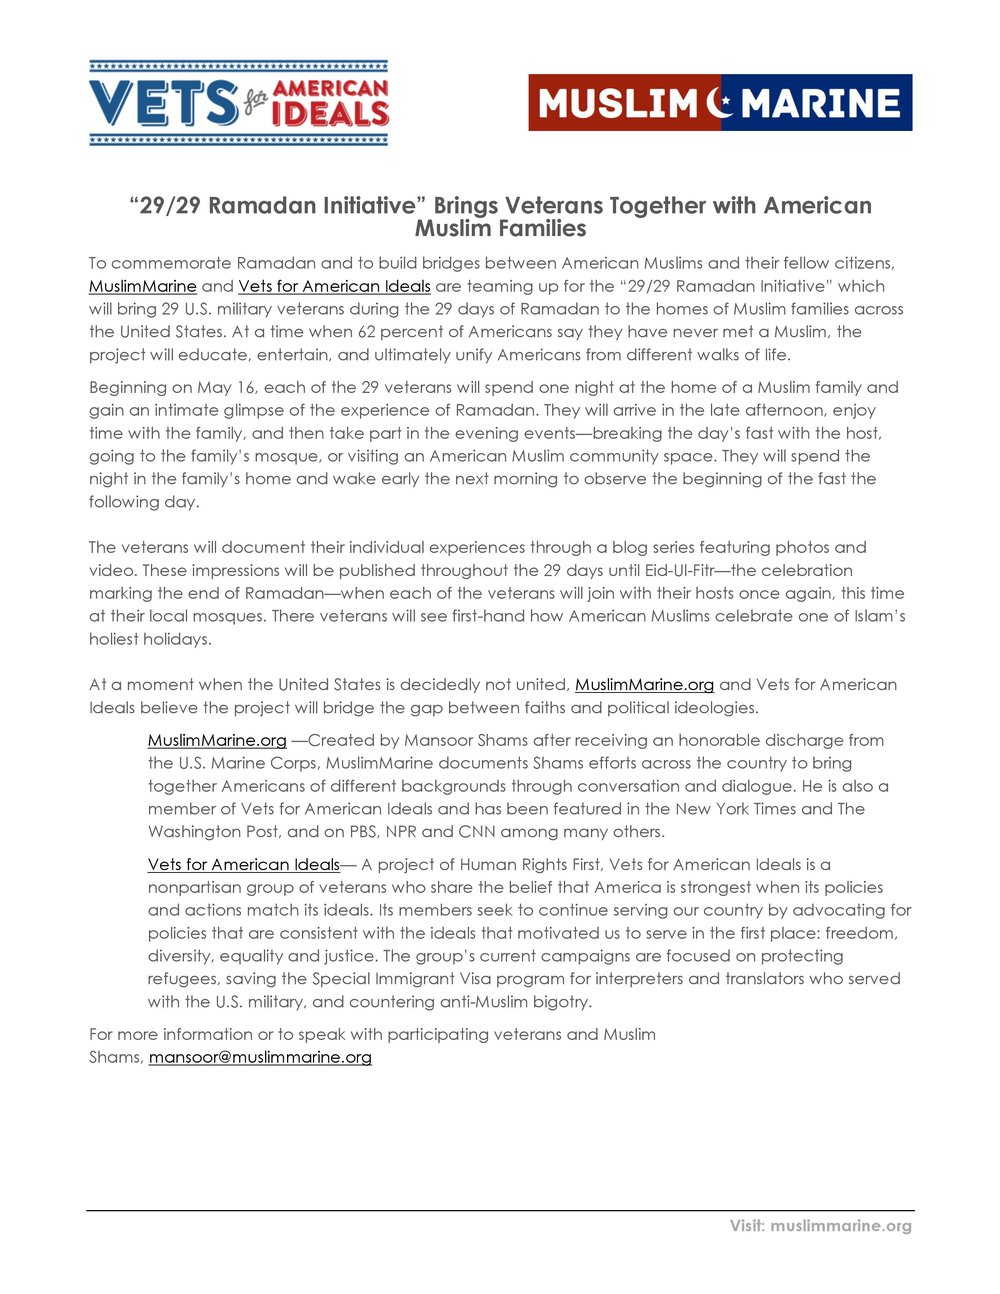 Ramadan Initiative Media Advisory-page-001.jpg